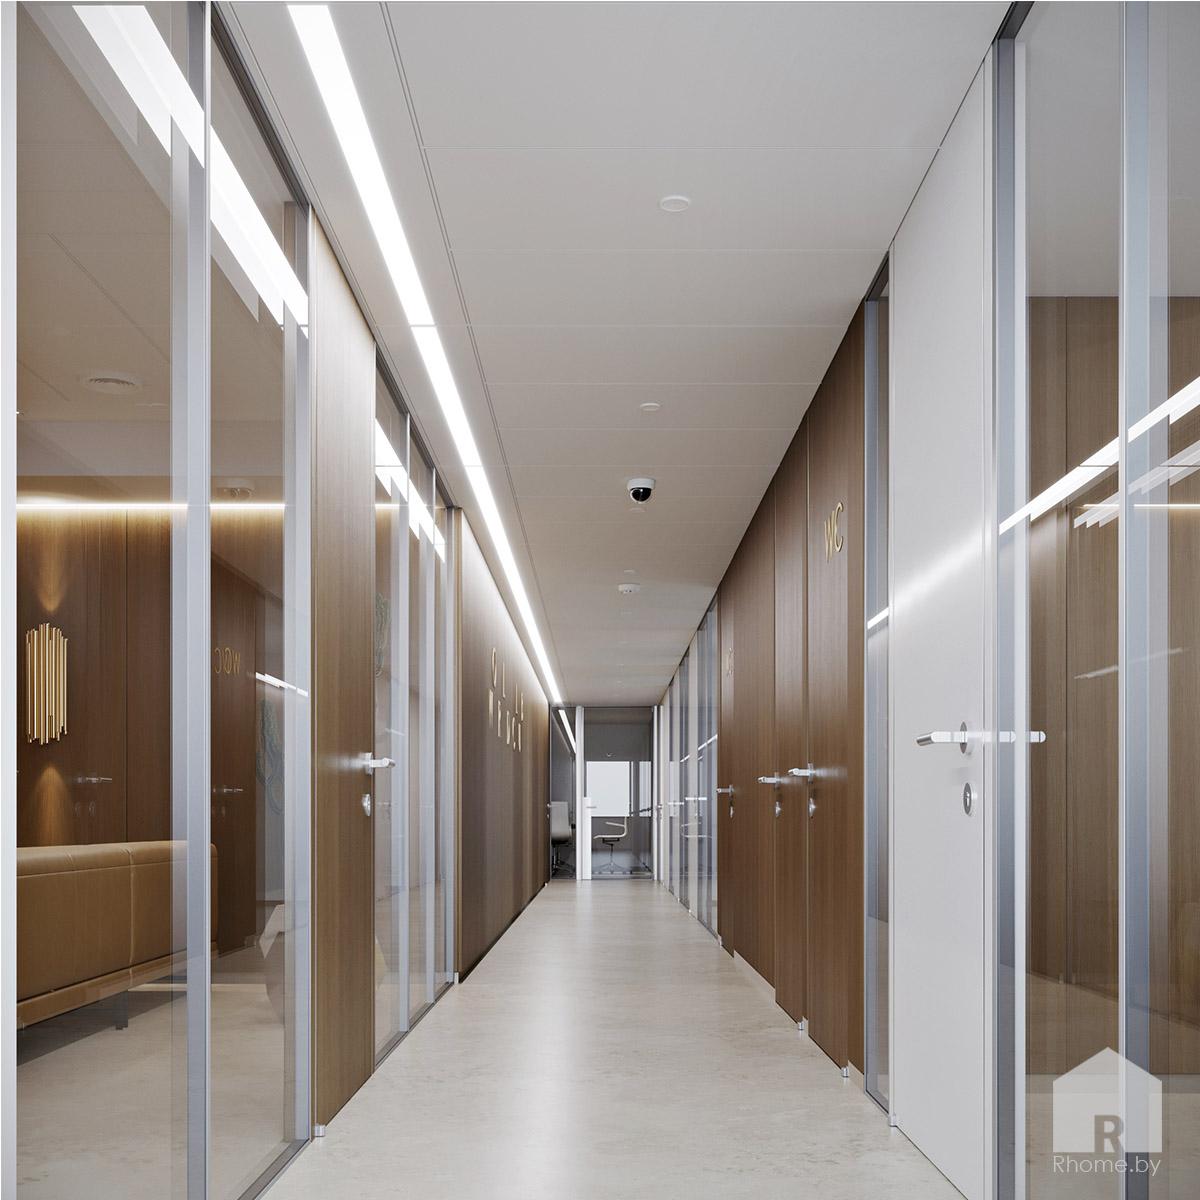 Дизайн офисного коридора | Дизайн студия – Rhome.by